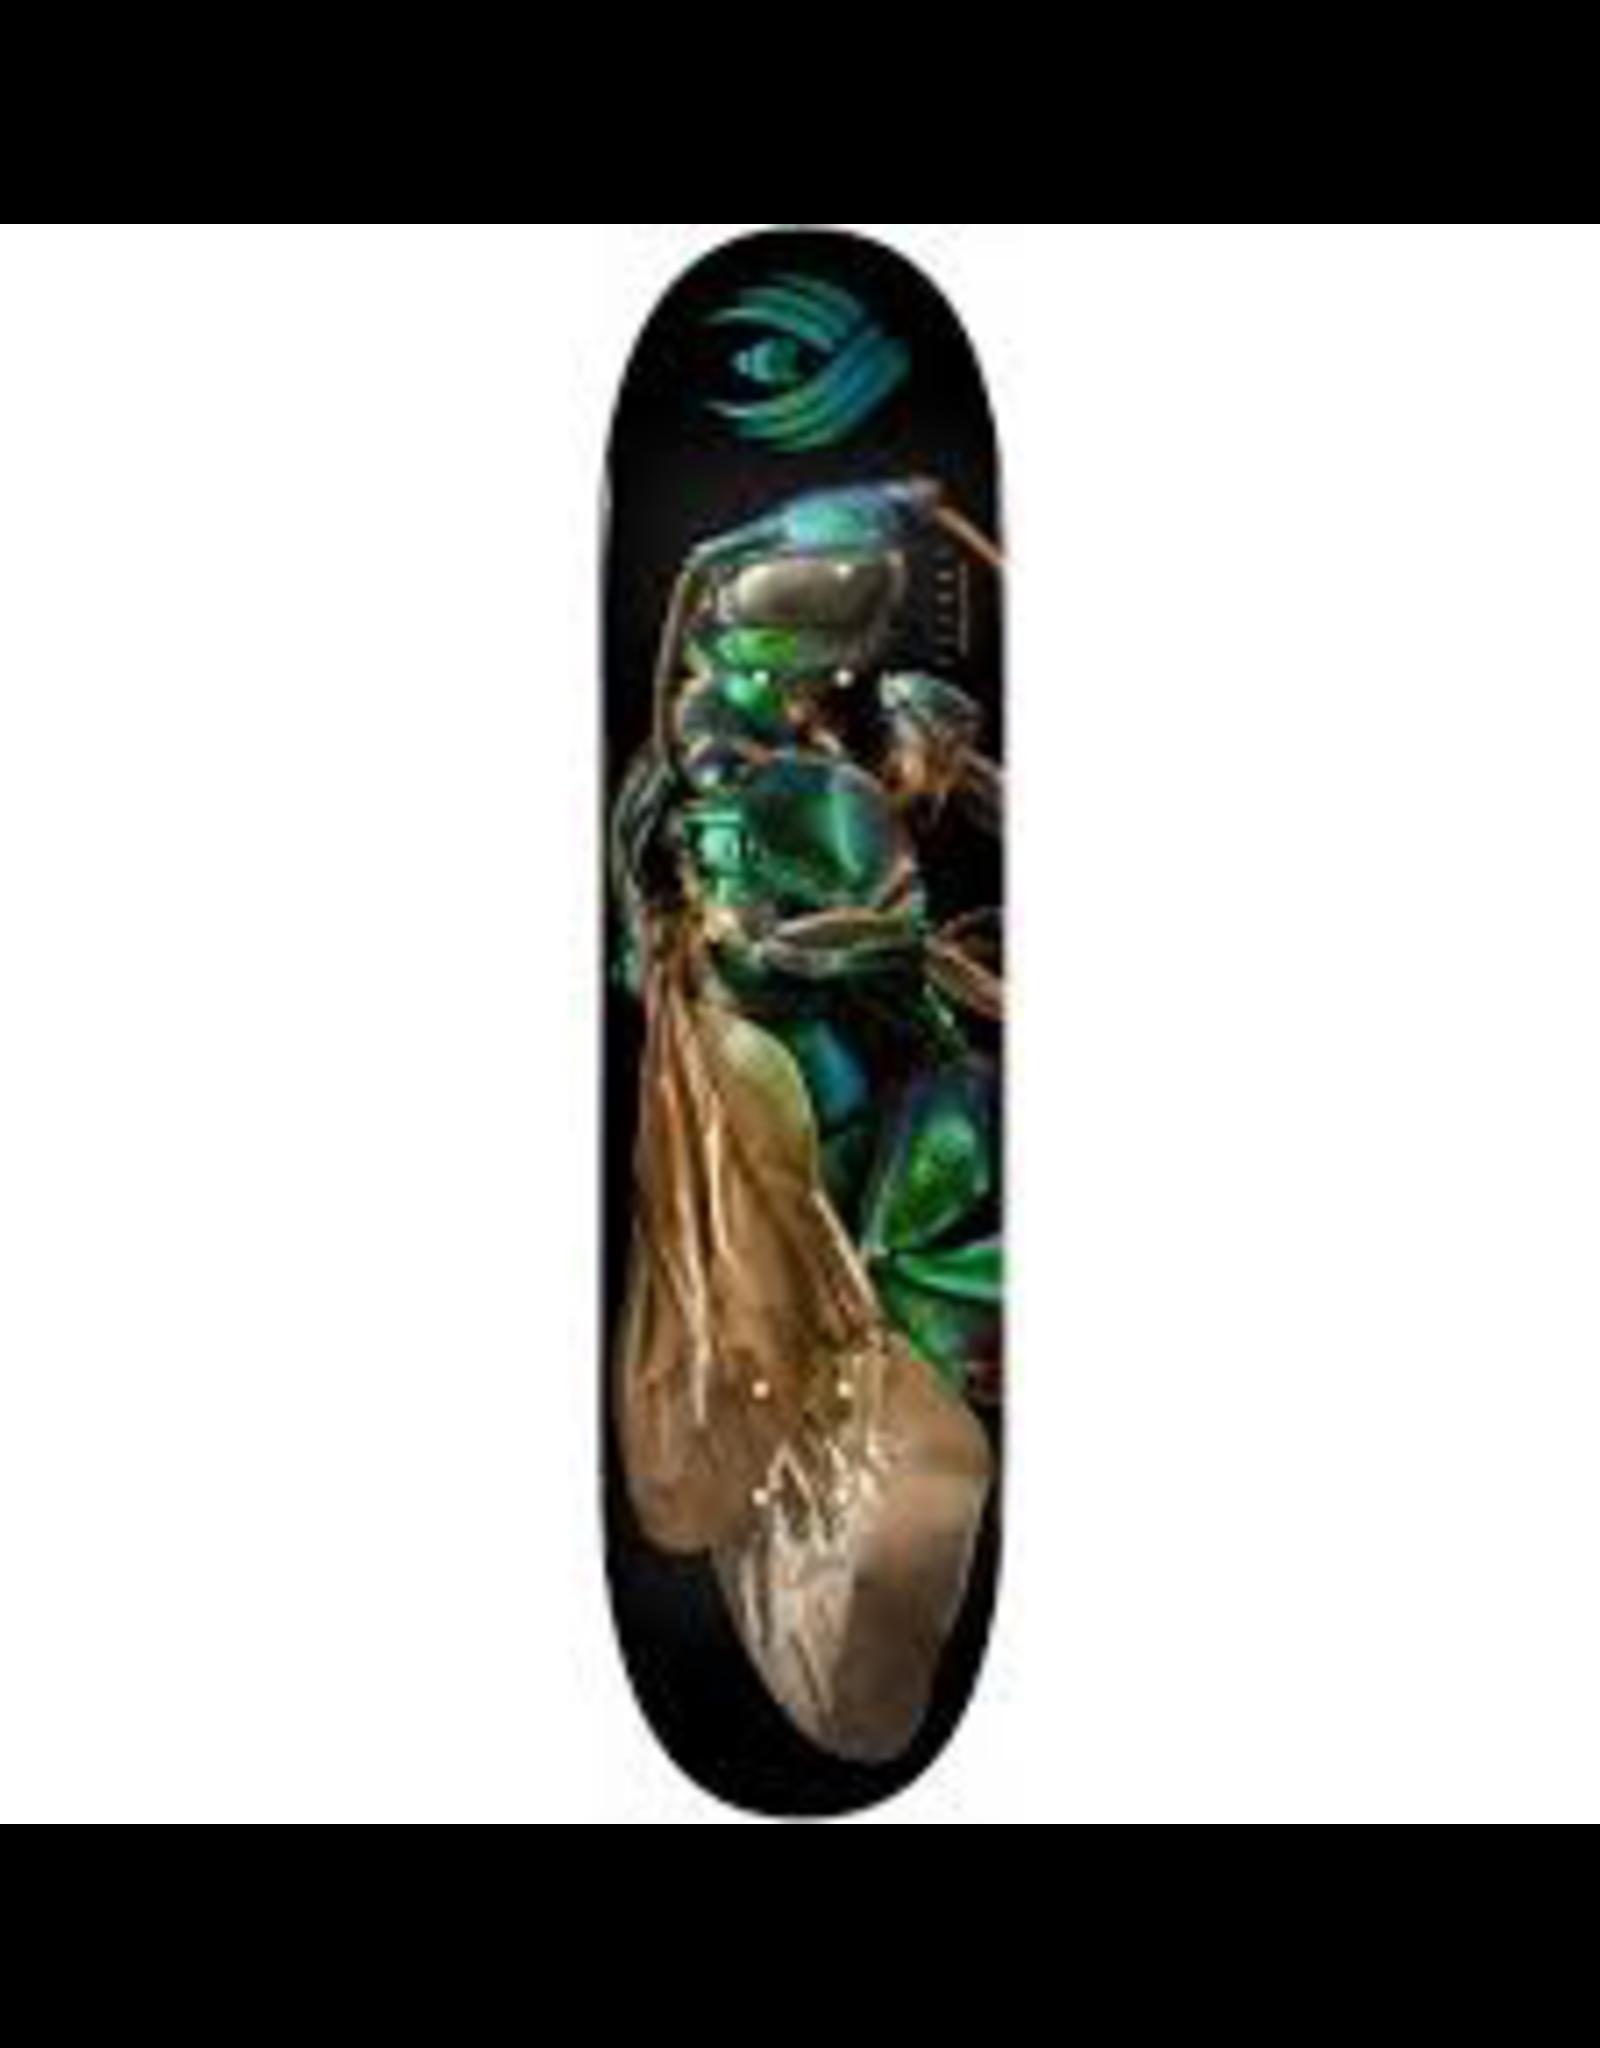 POWELL Powell Peralta Skateboard Deck BISS Cuckoo Bee - Shape 242 - 8 x 31.45